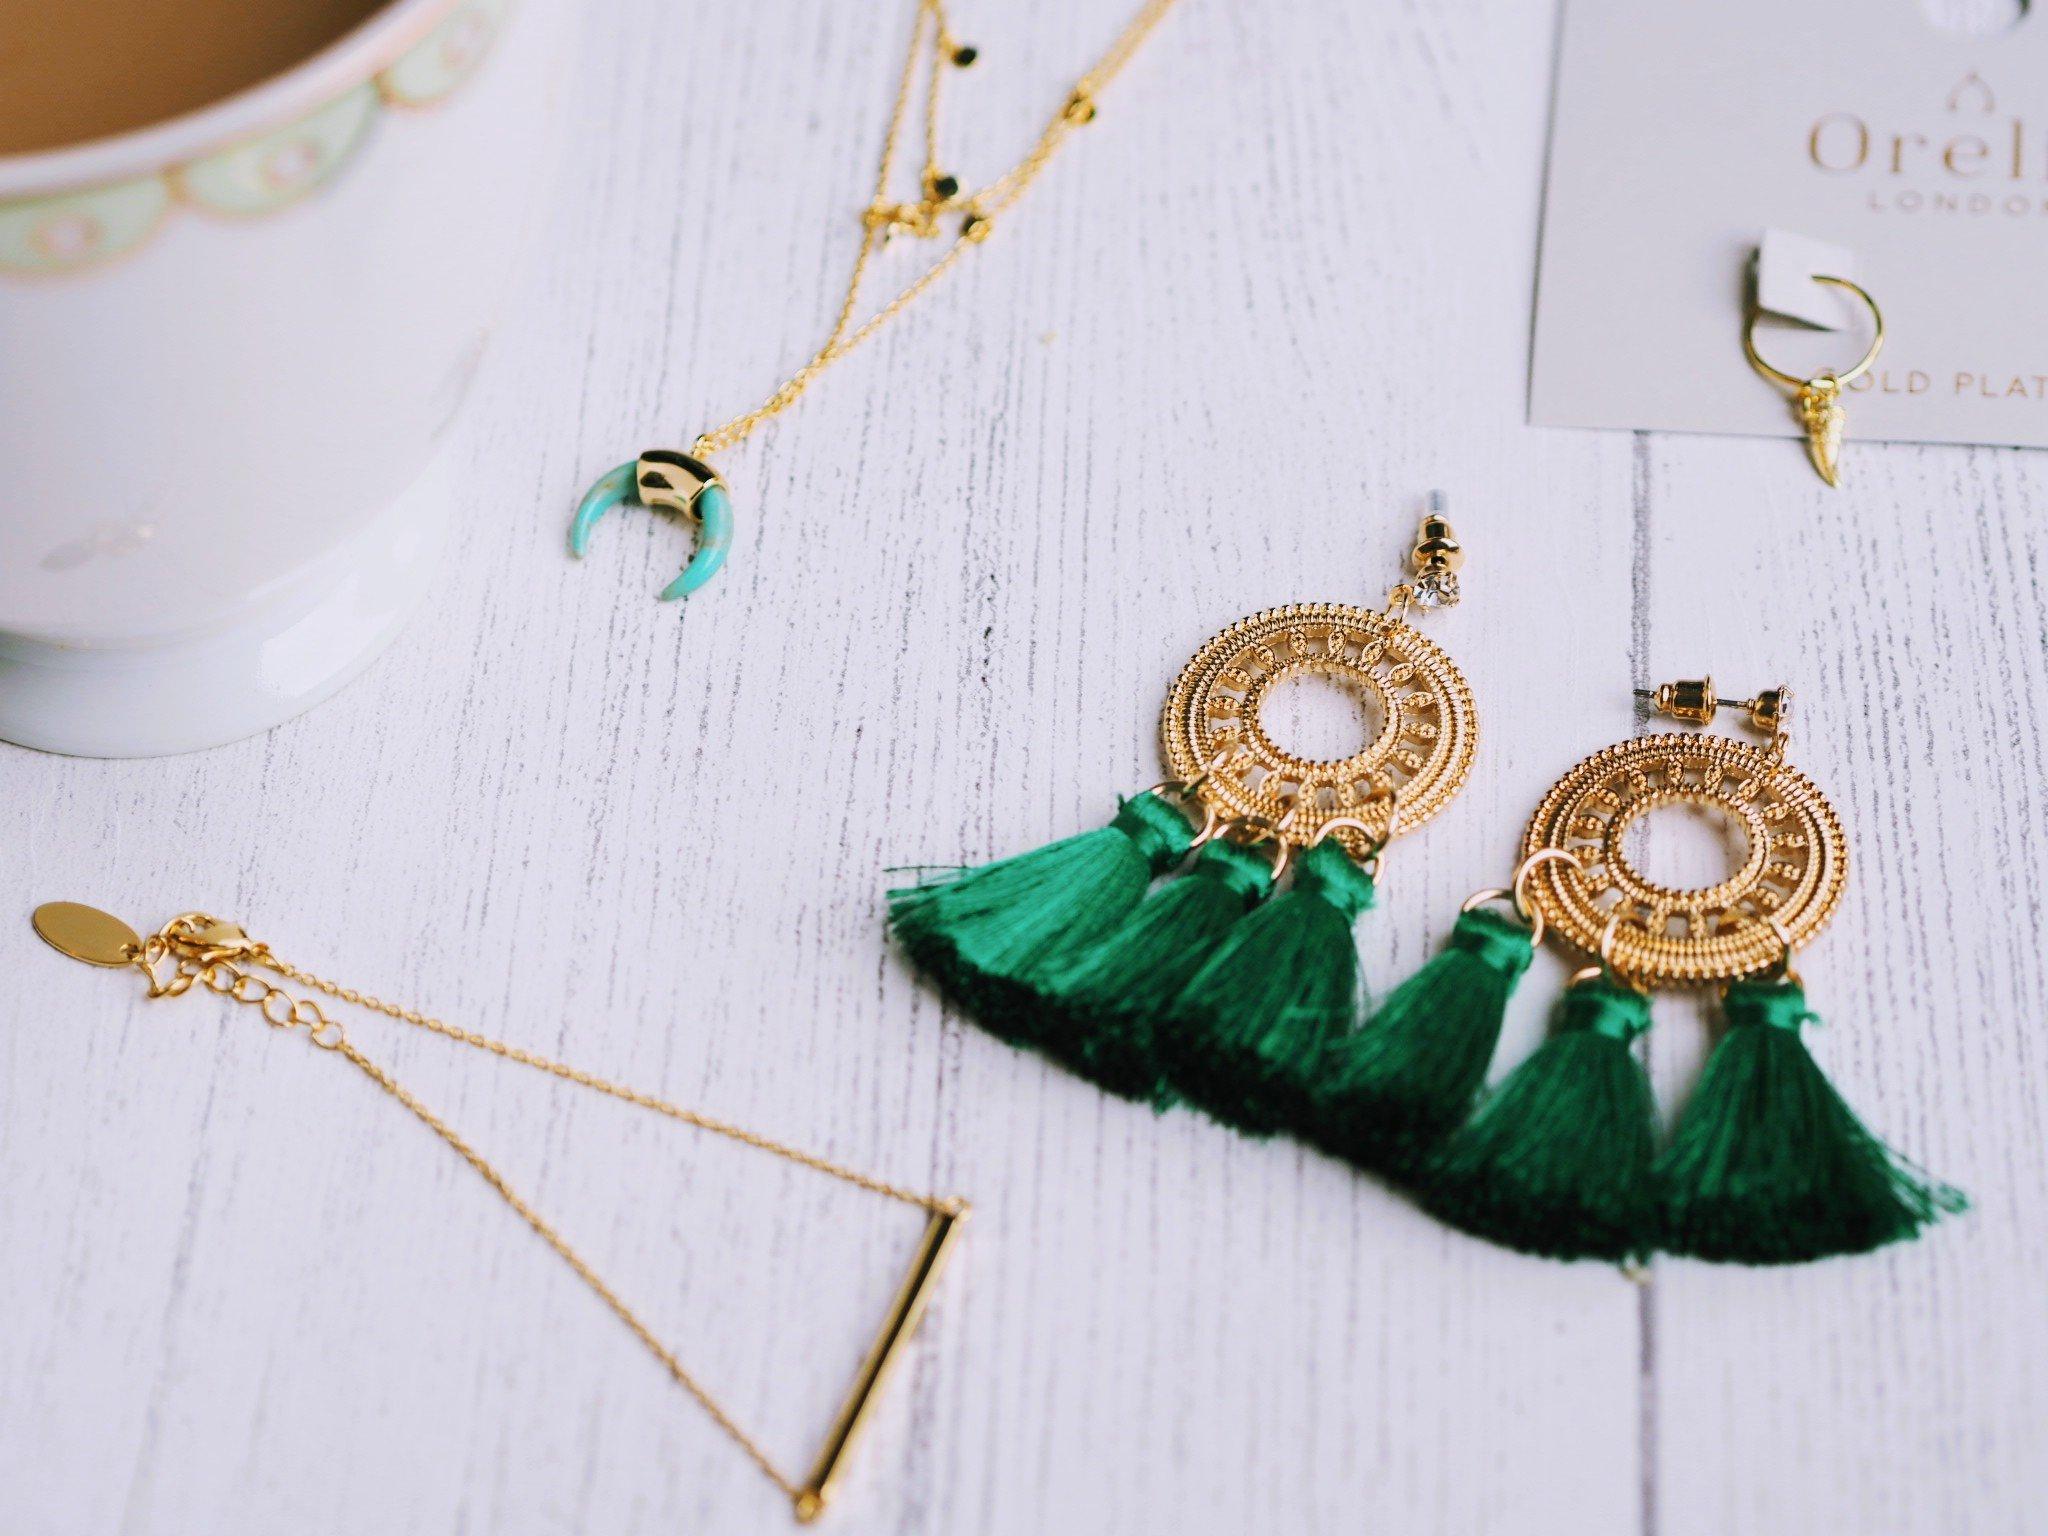 Orellia Jewellery Tassel Earrings